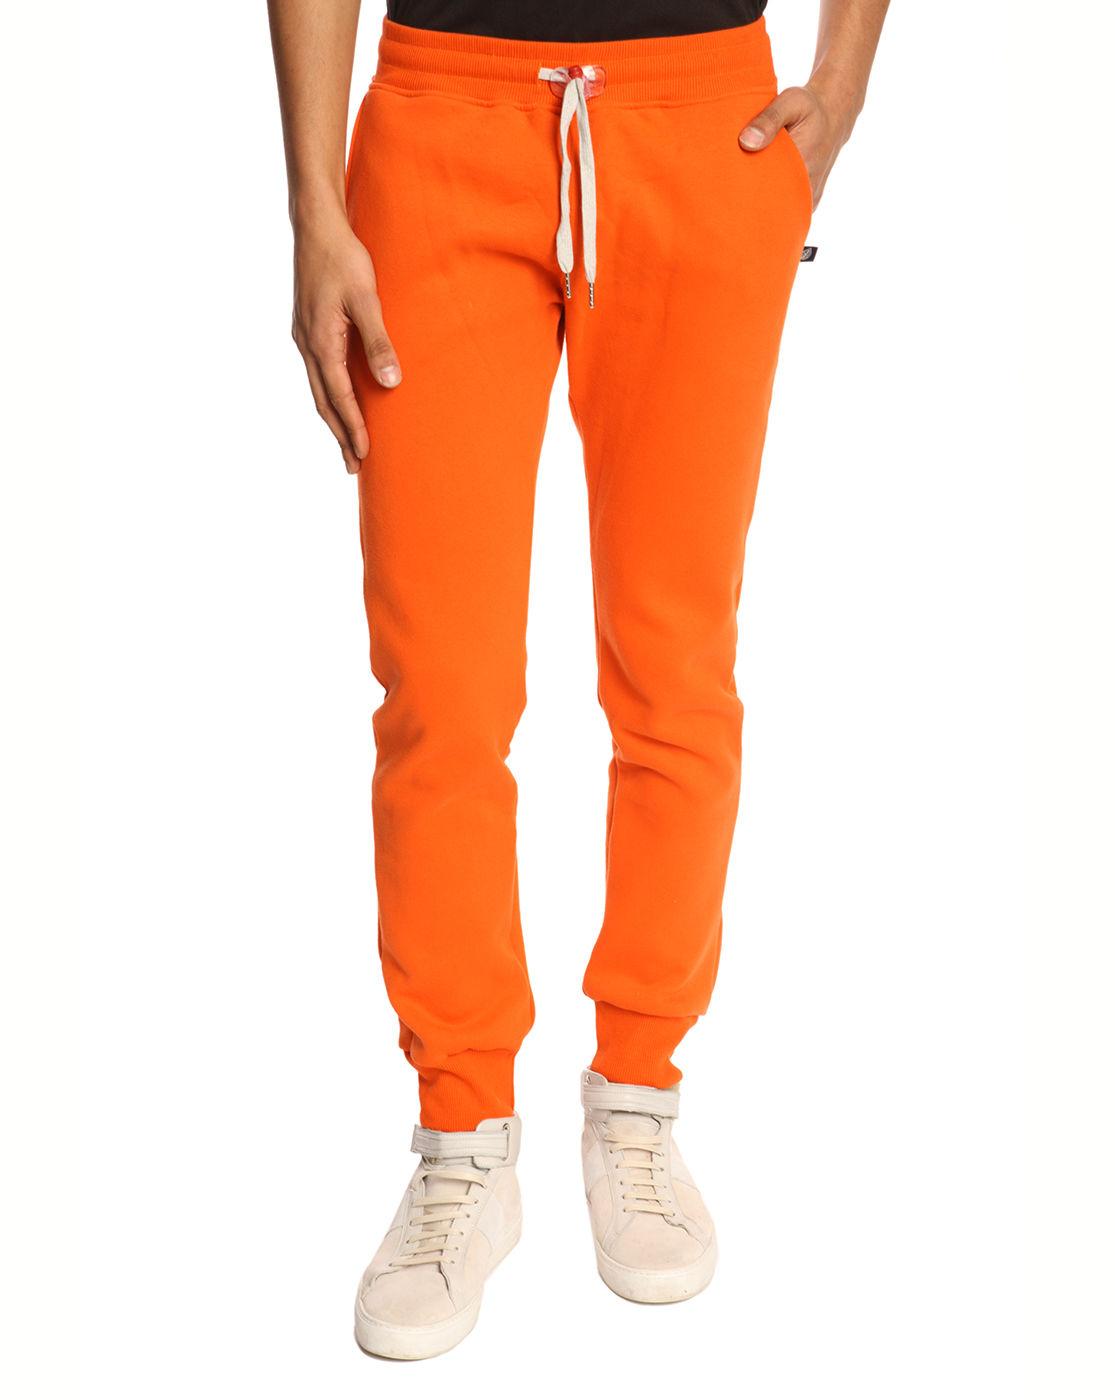 Sweet Pants Slim Fit Orange Jogging Bottoms In Orange For